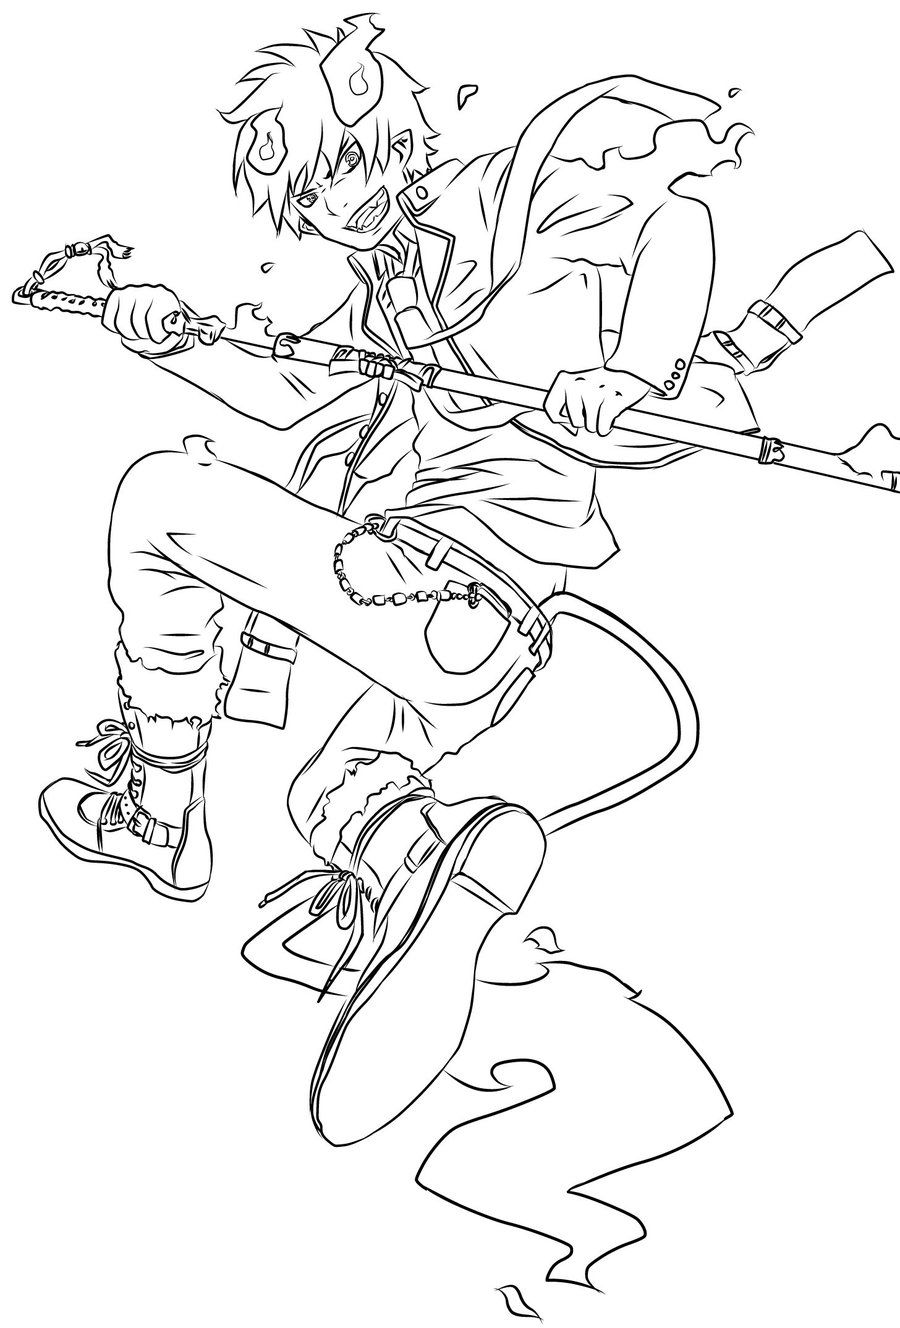 Animax Action Blue Exorcist Fan Art Coloring Books Blue Exorcist Train Coloring Pages